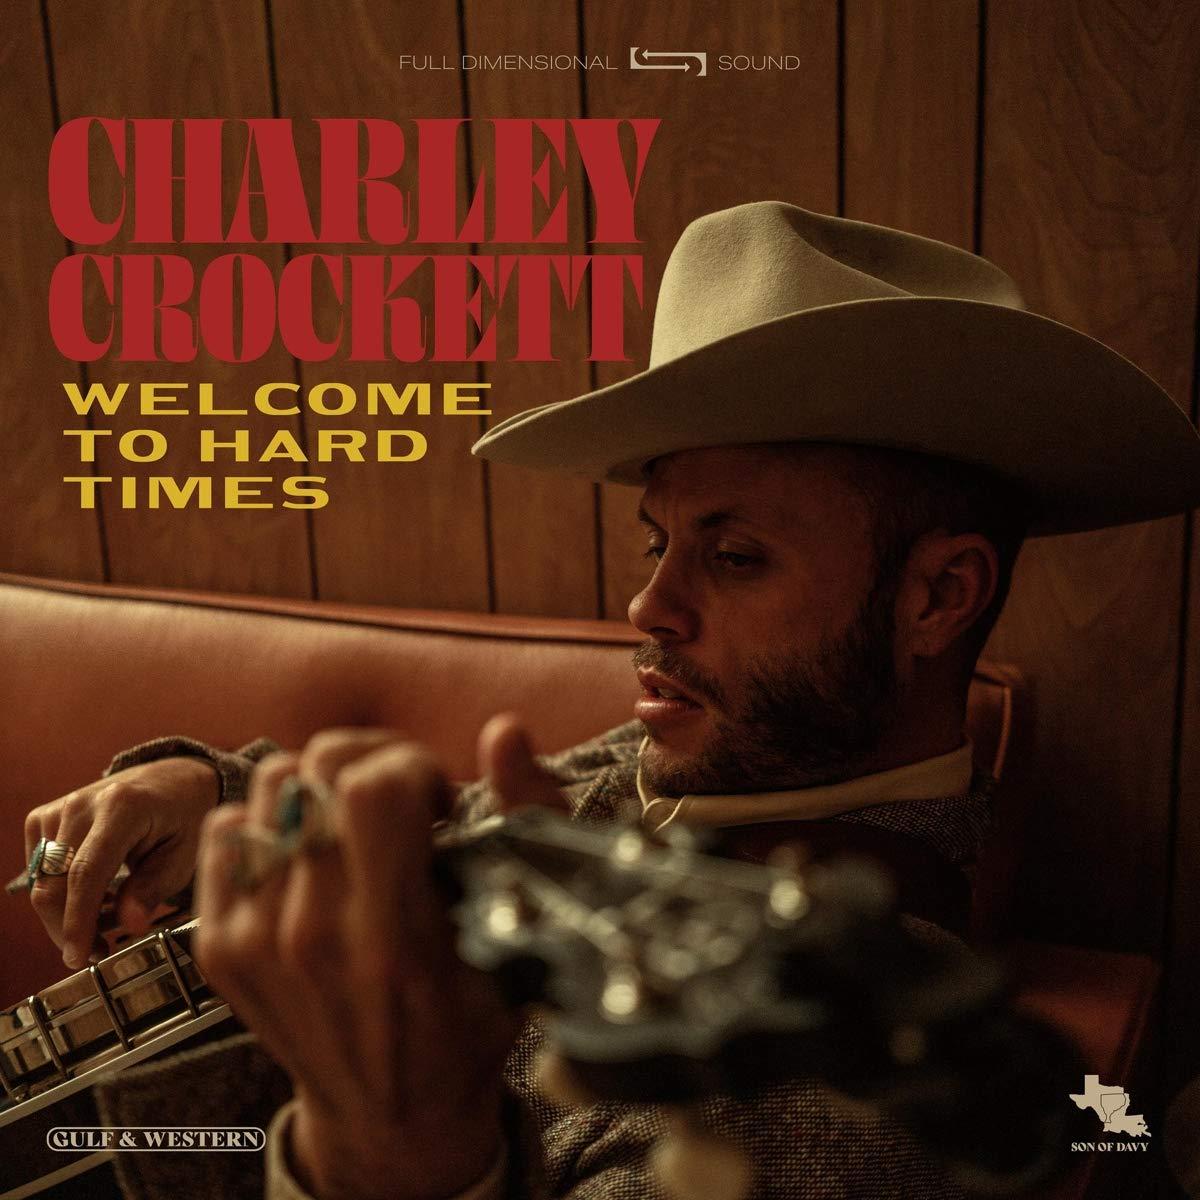 Charley Crockett_Welcome to Hard Times